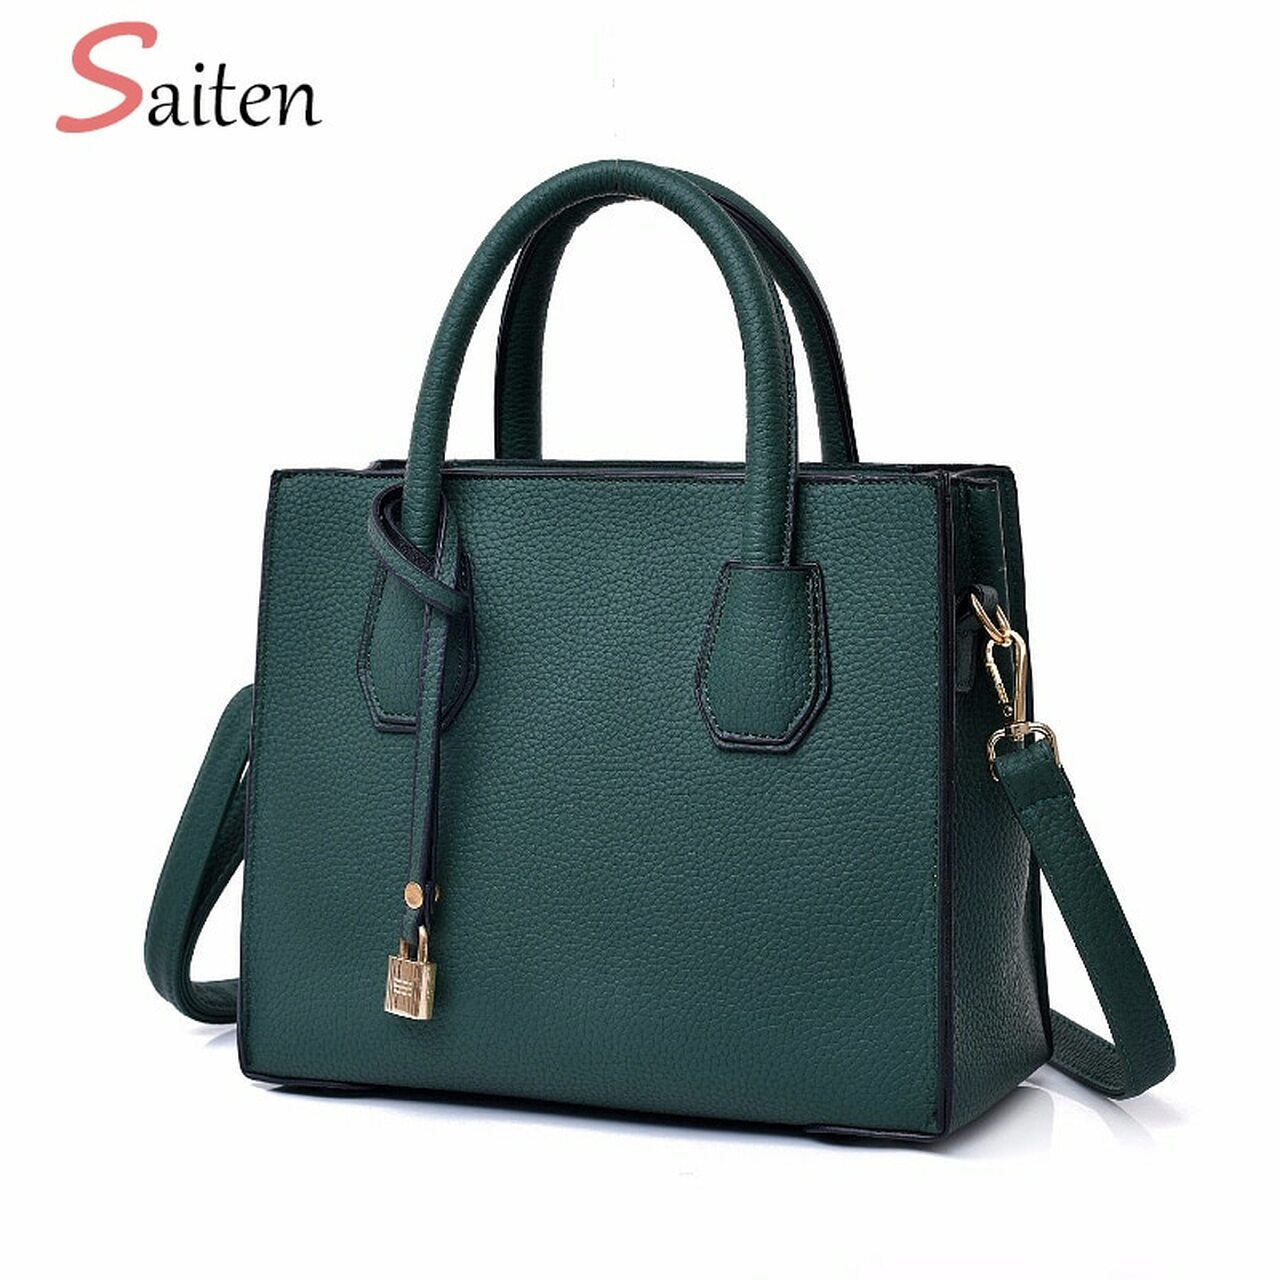 c8d6de449d0 Fashion Litchi Pattern Leather Handbags Women Casual Tote Women's Bags Lock  Pendant Vintage Women Handbags Ladies Crossbody Bags